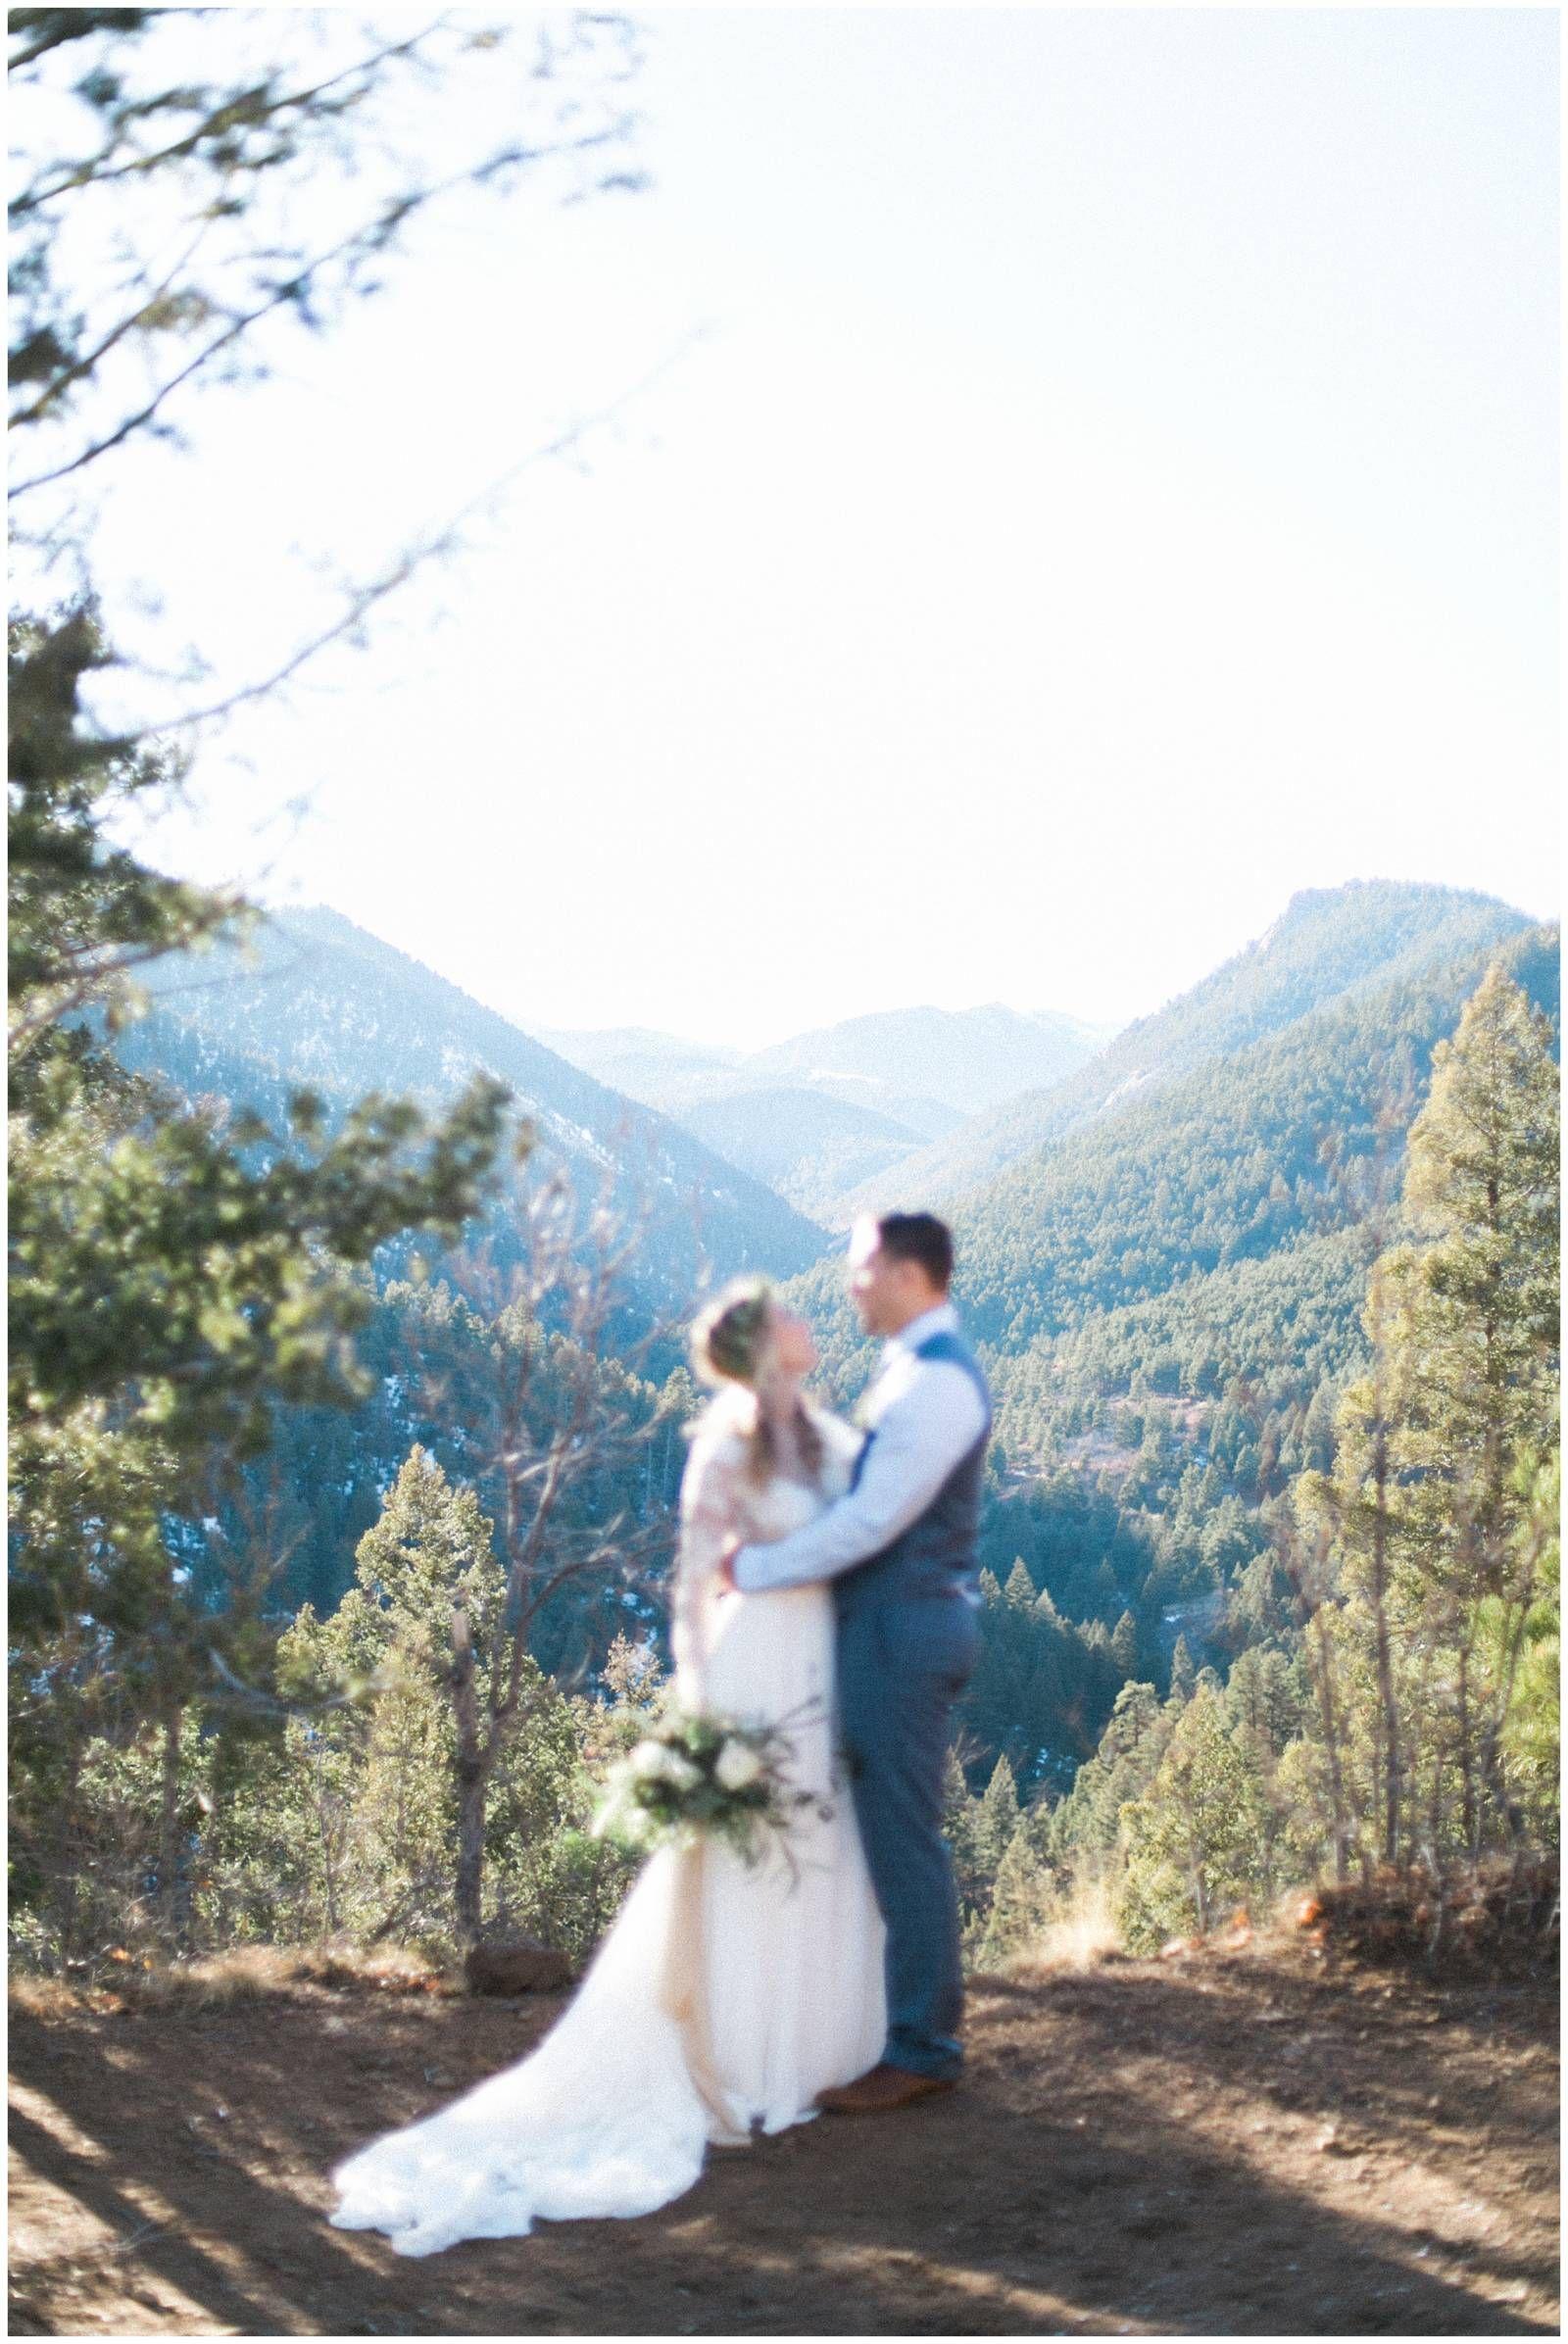 Romantic and Weddings